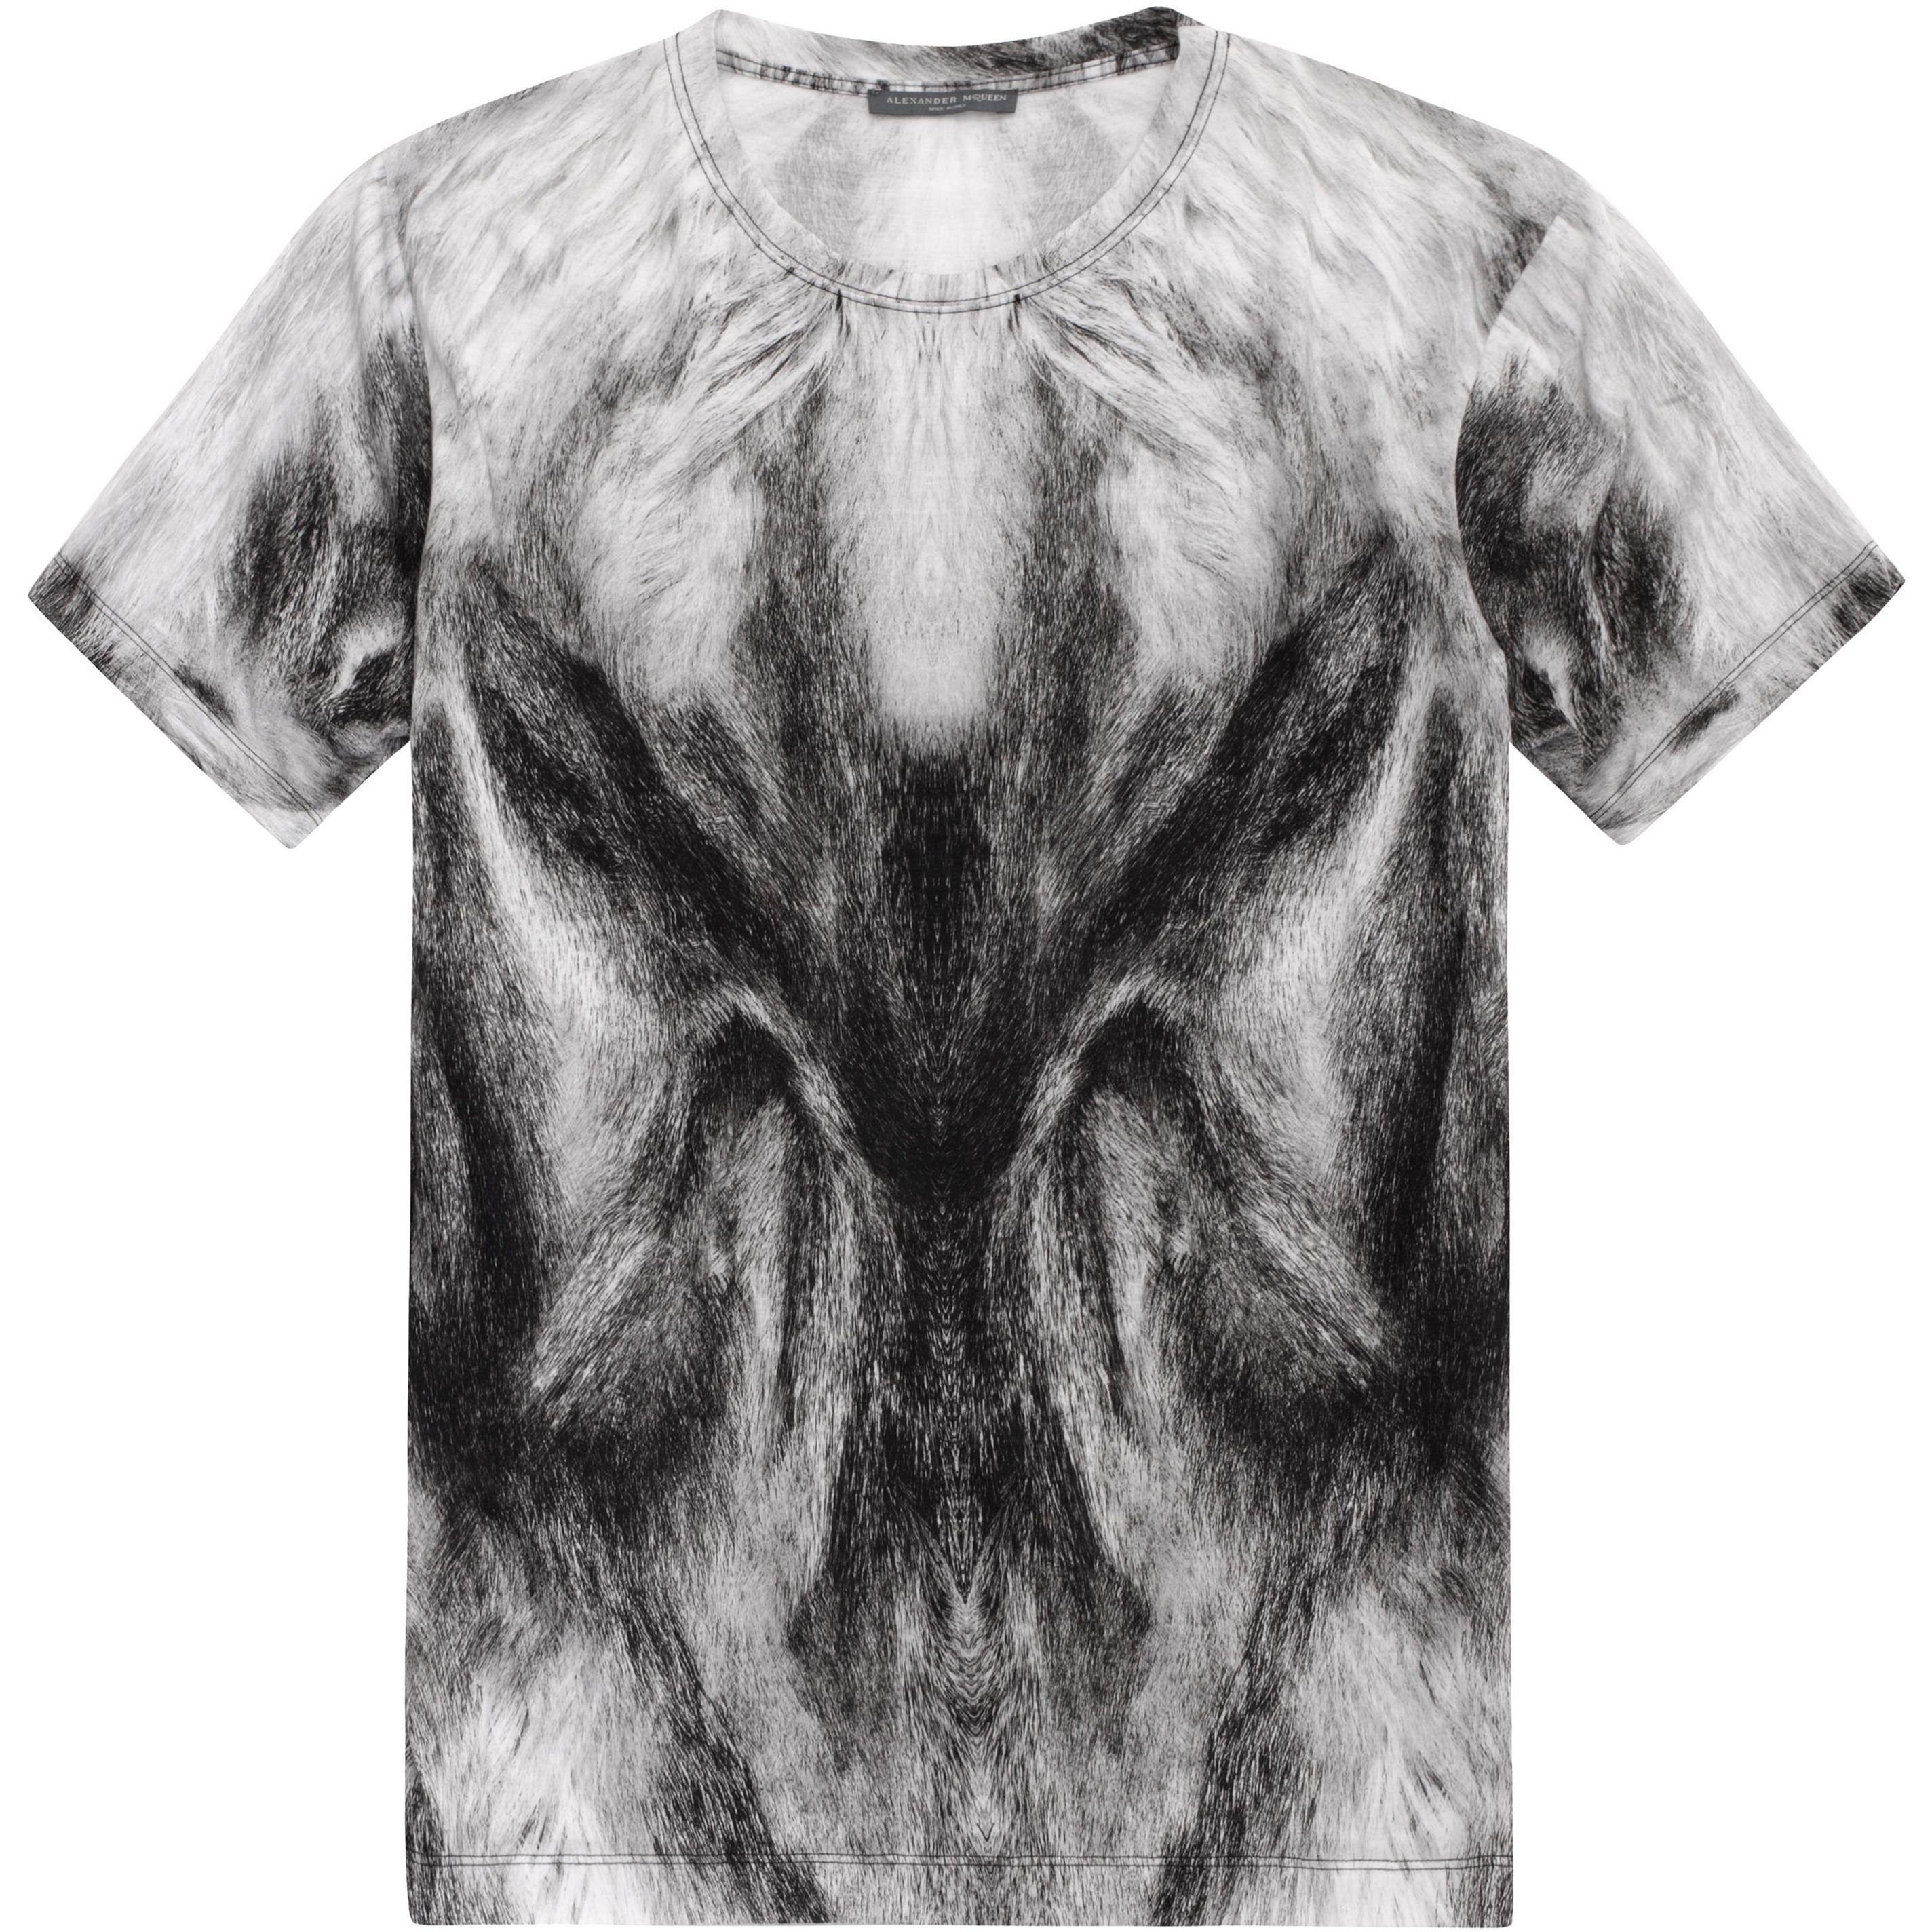 Women T-shirt & tank - Women Tops & knitwear on ALEXANDER MCQUEEN Online Store